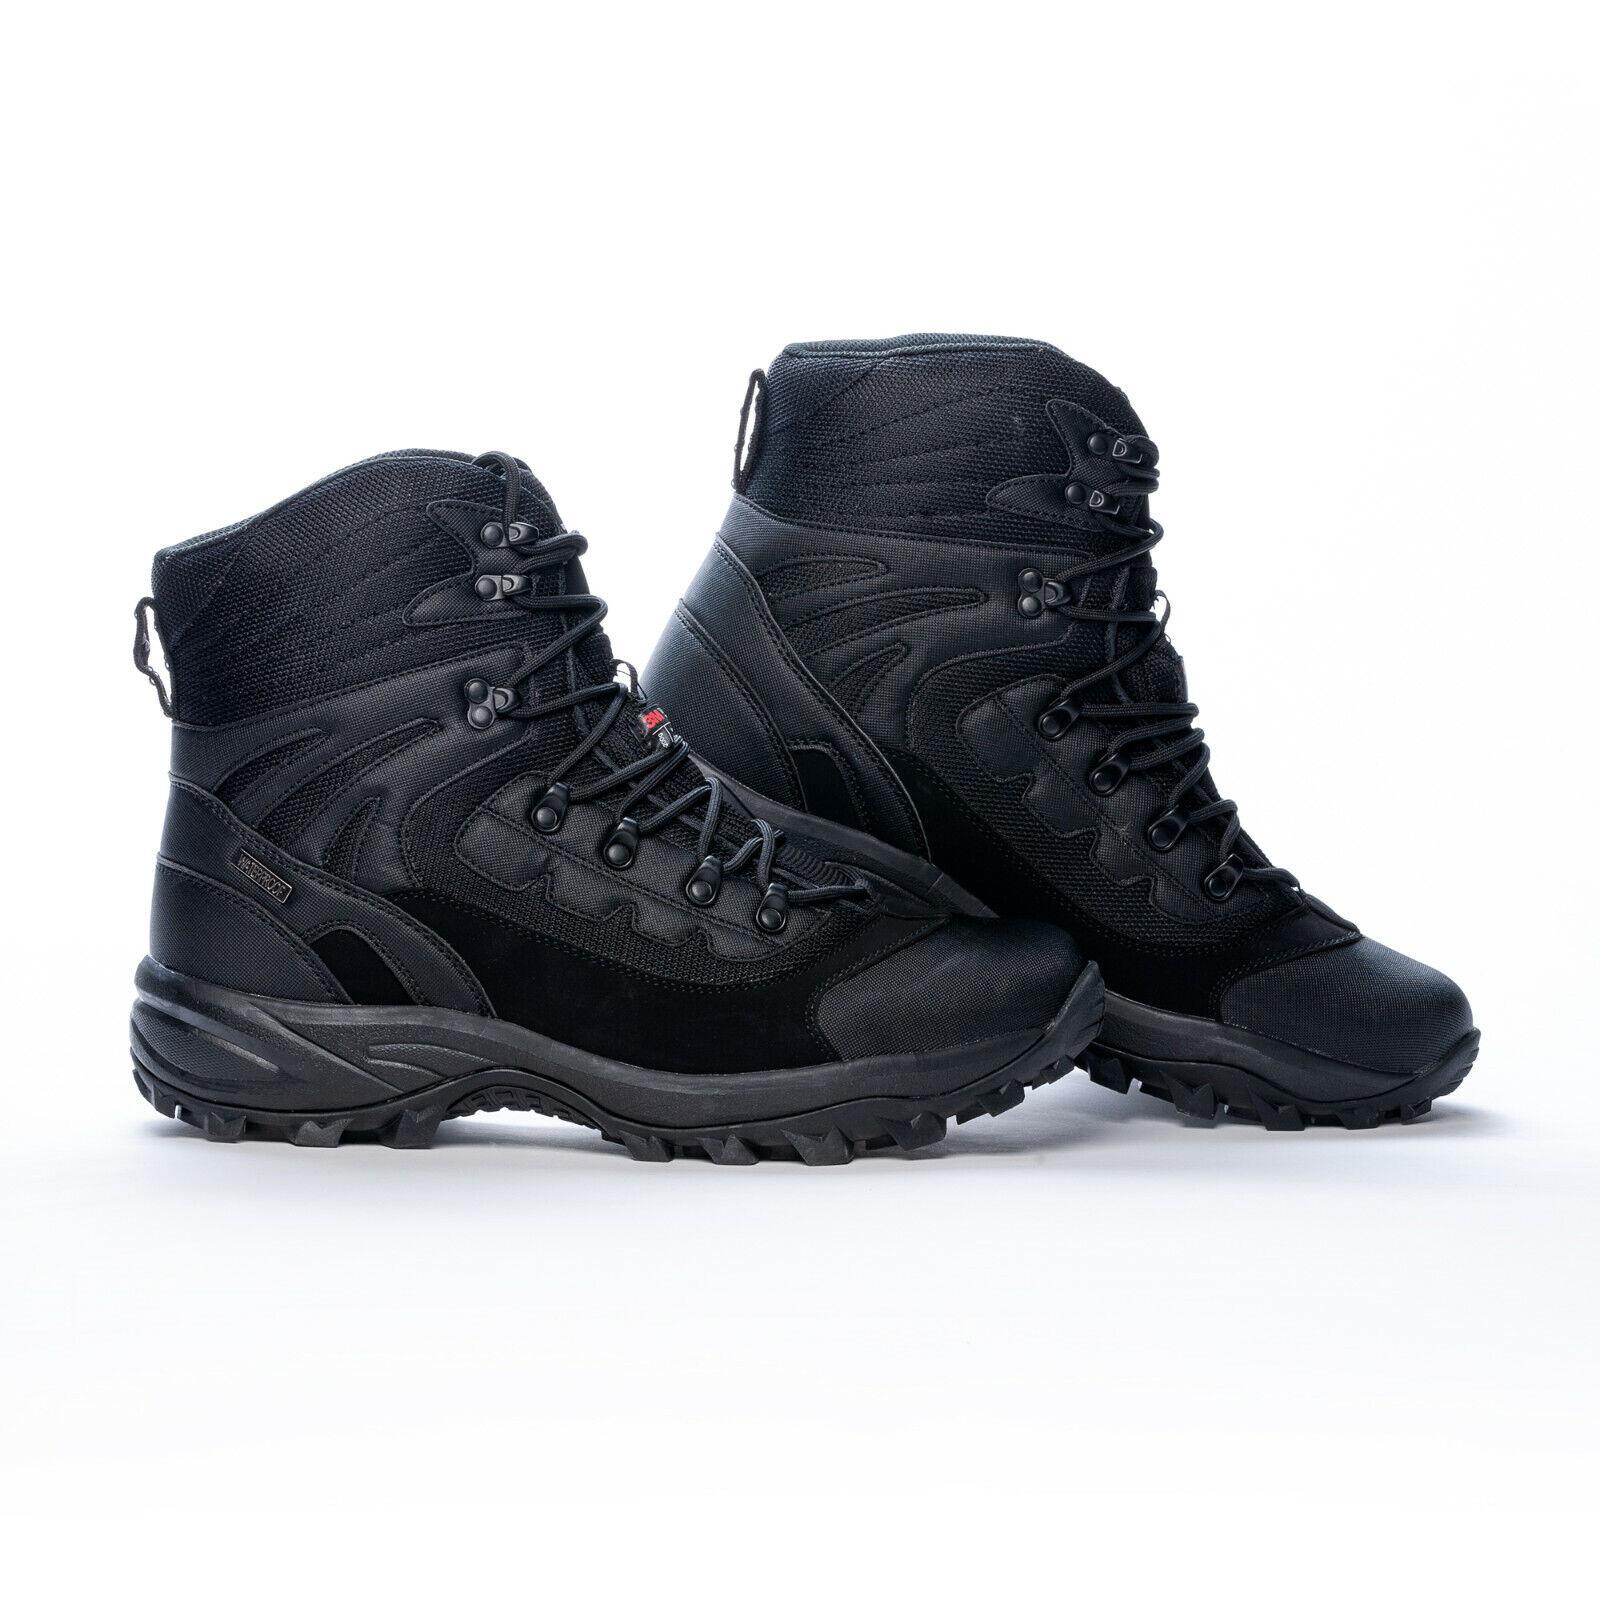 Scarponi Montagna Thinsulate Inverno All'Aperto Stiefel schwarz schuhe Bw Stivaletti